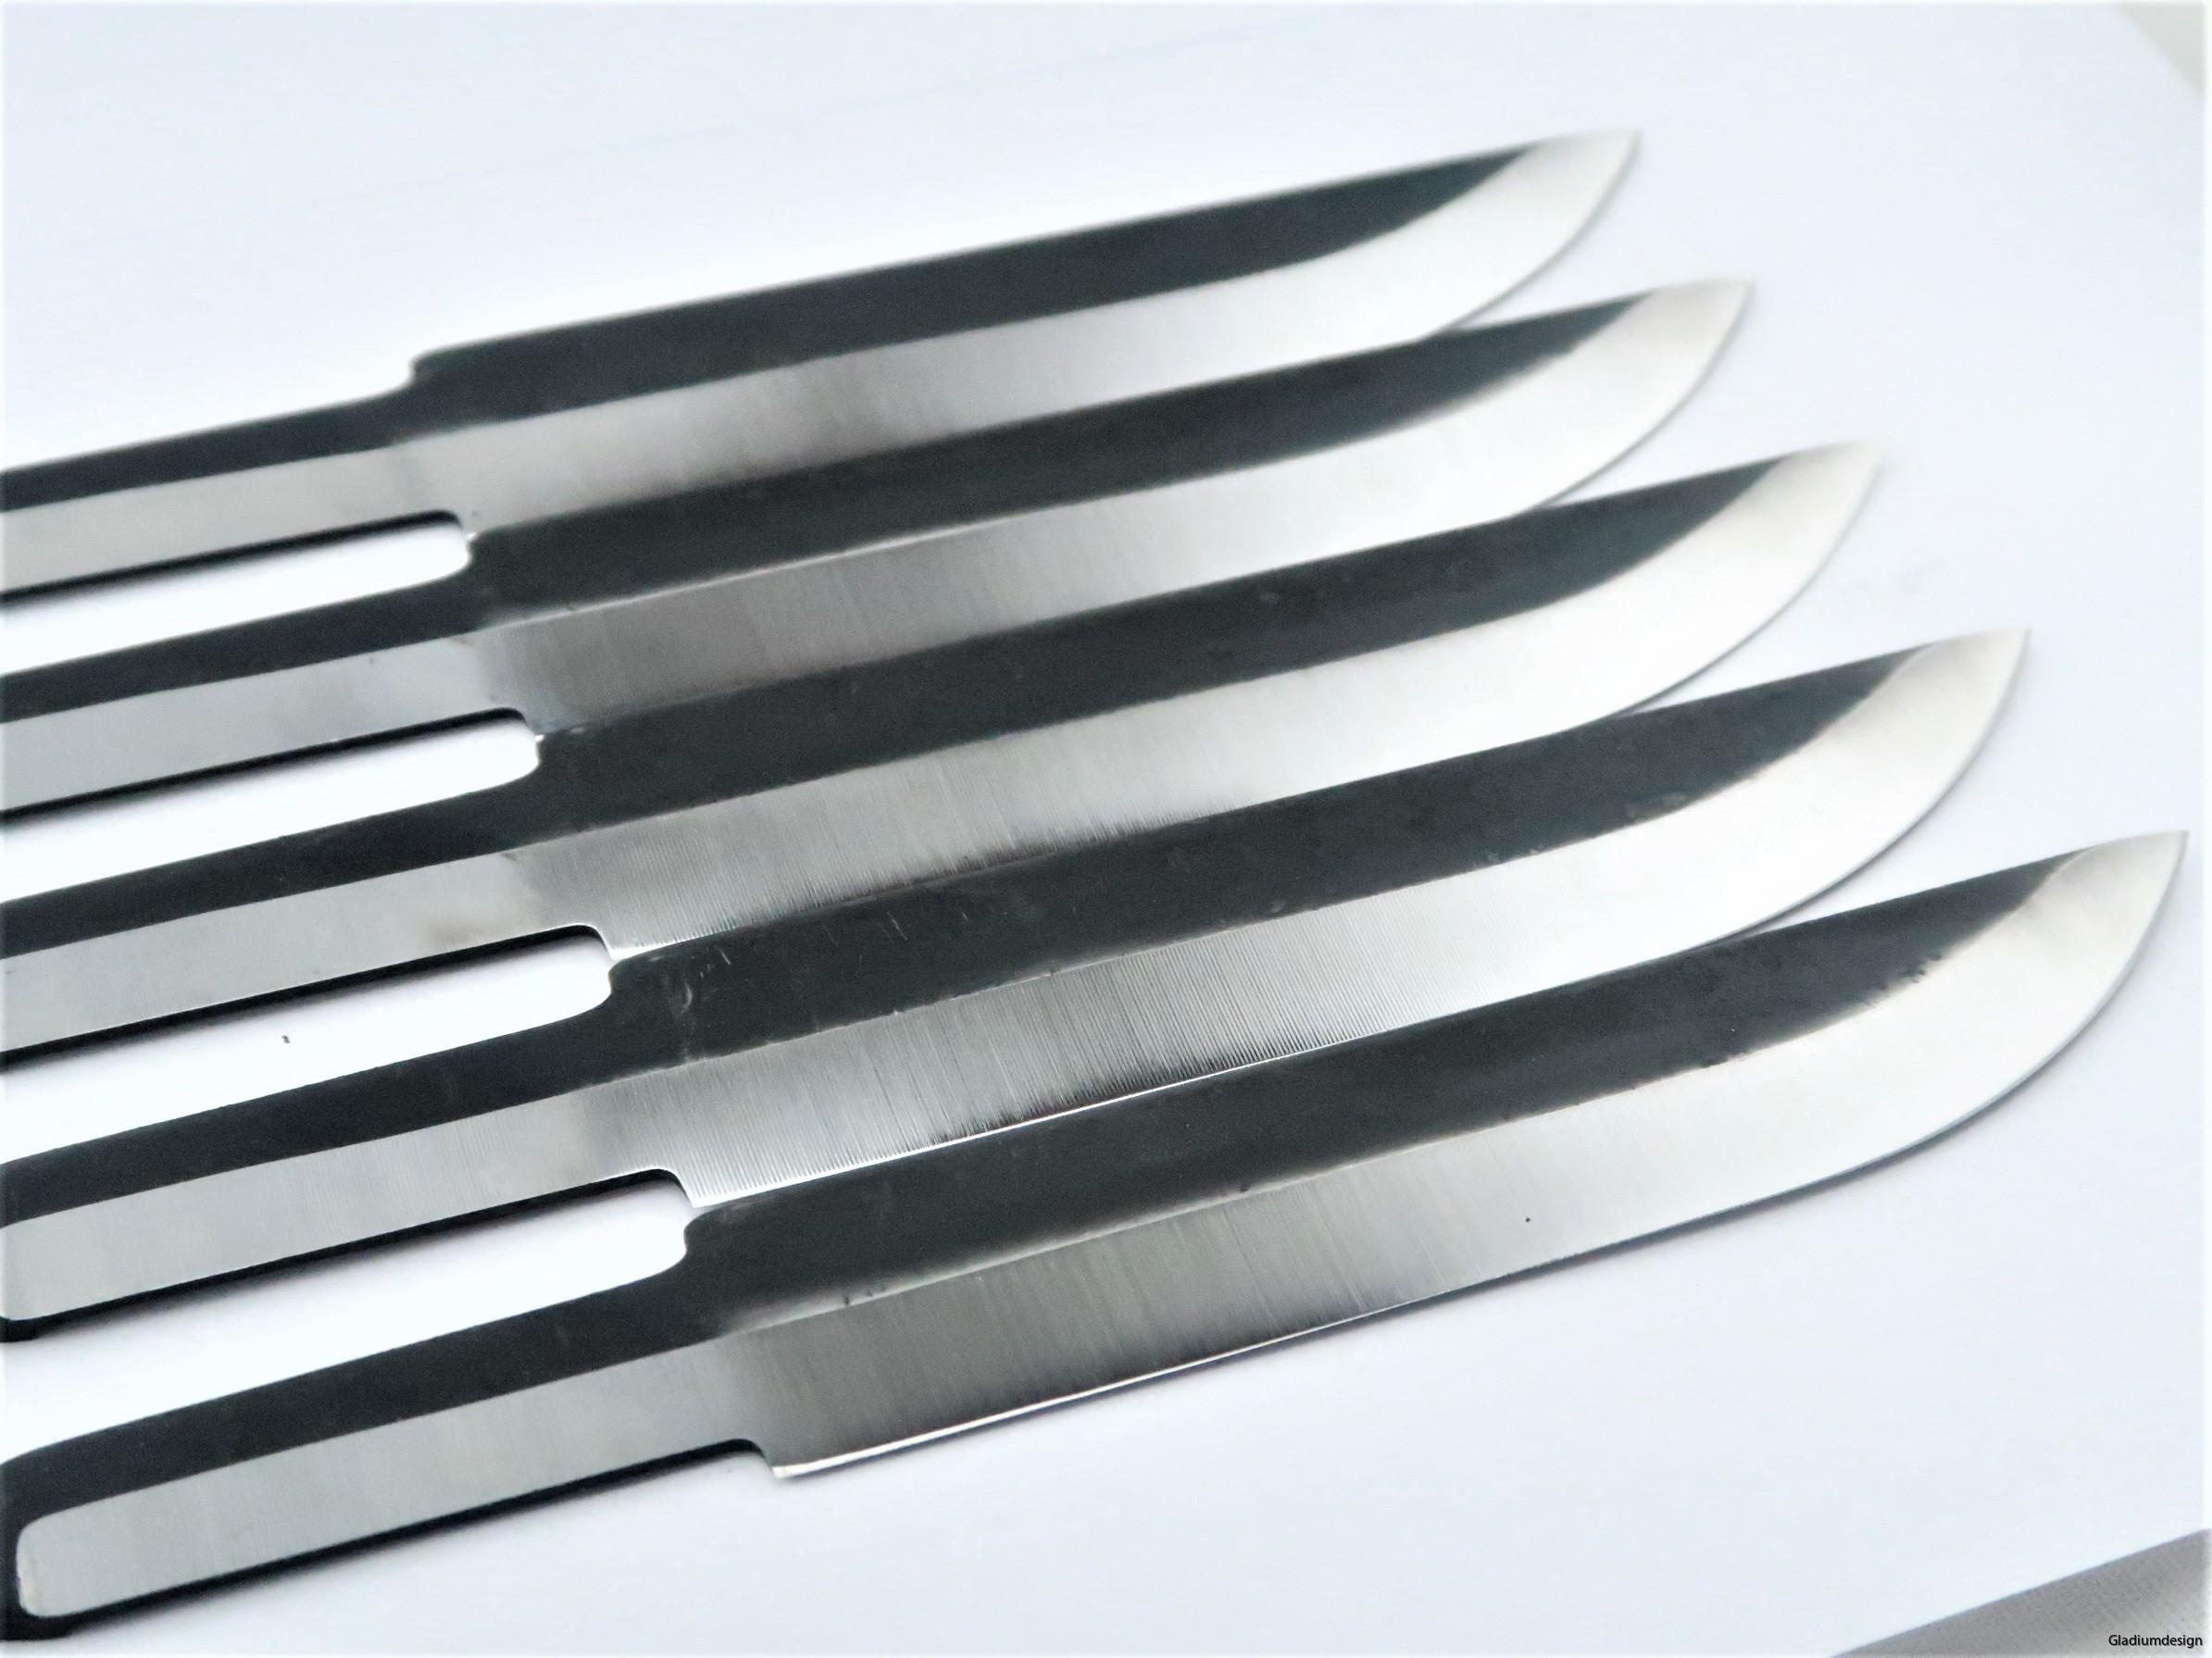 Scandi knifeblade